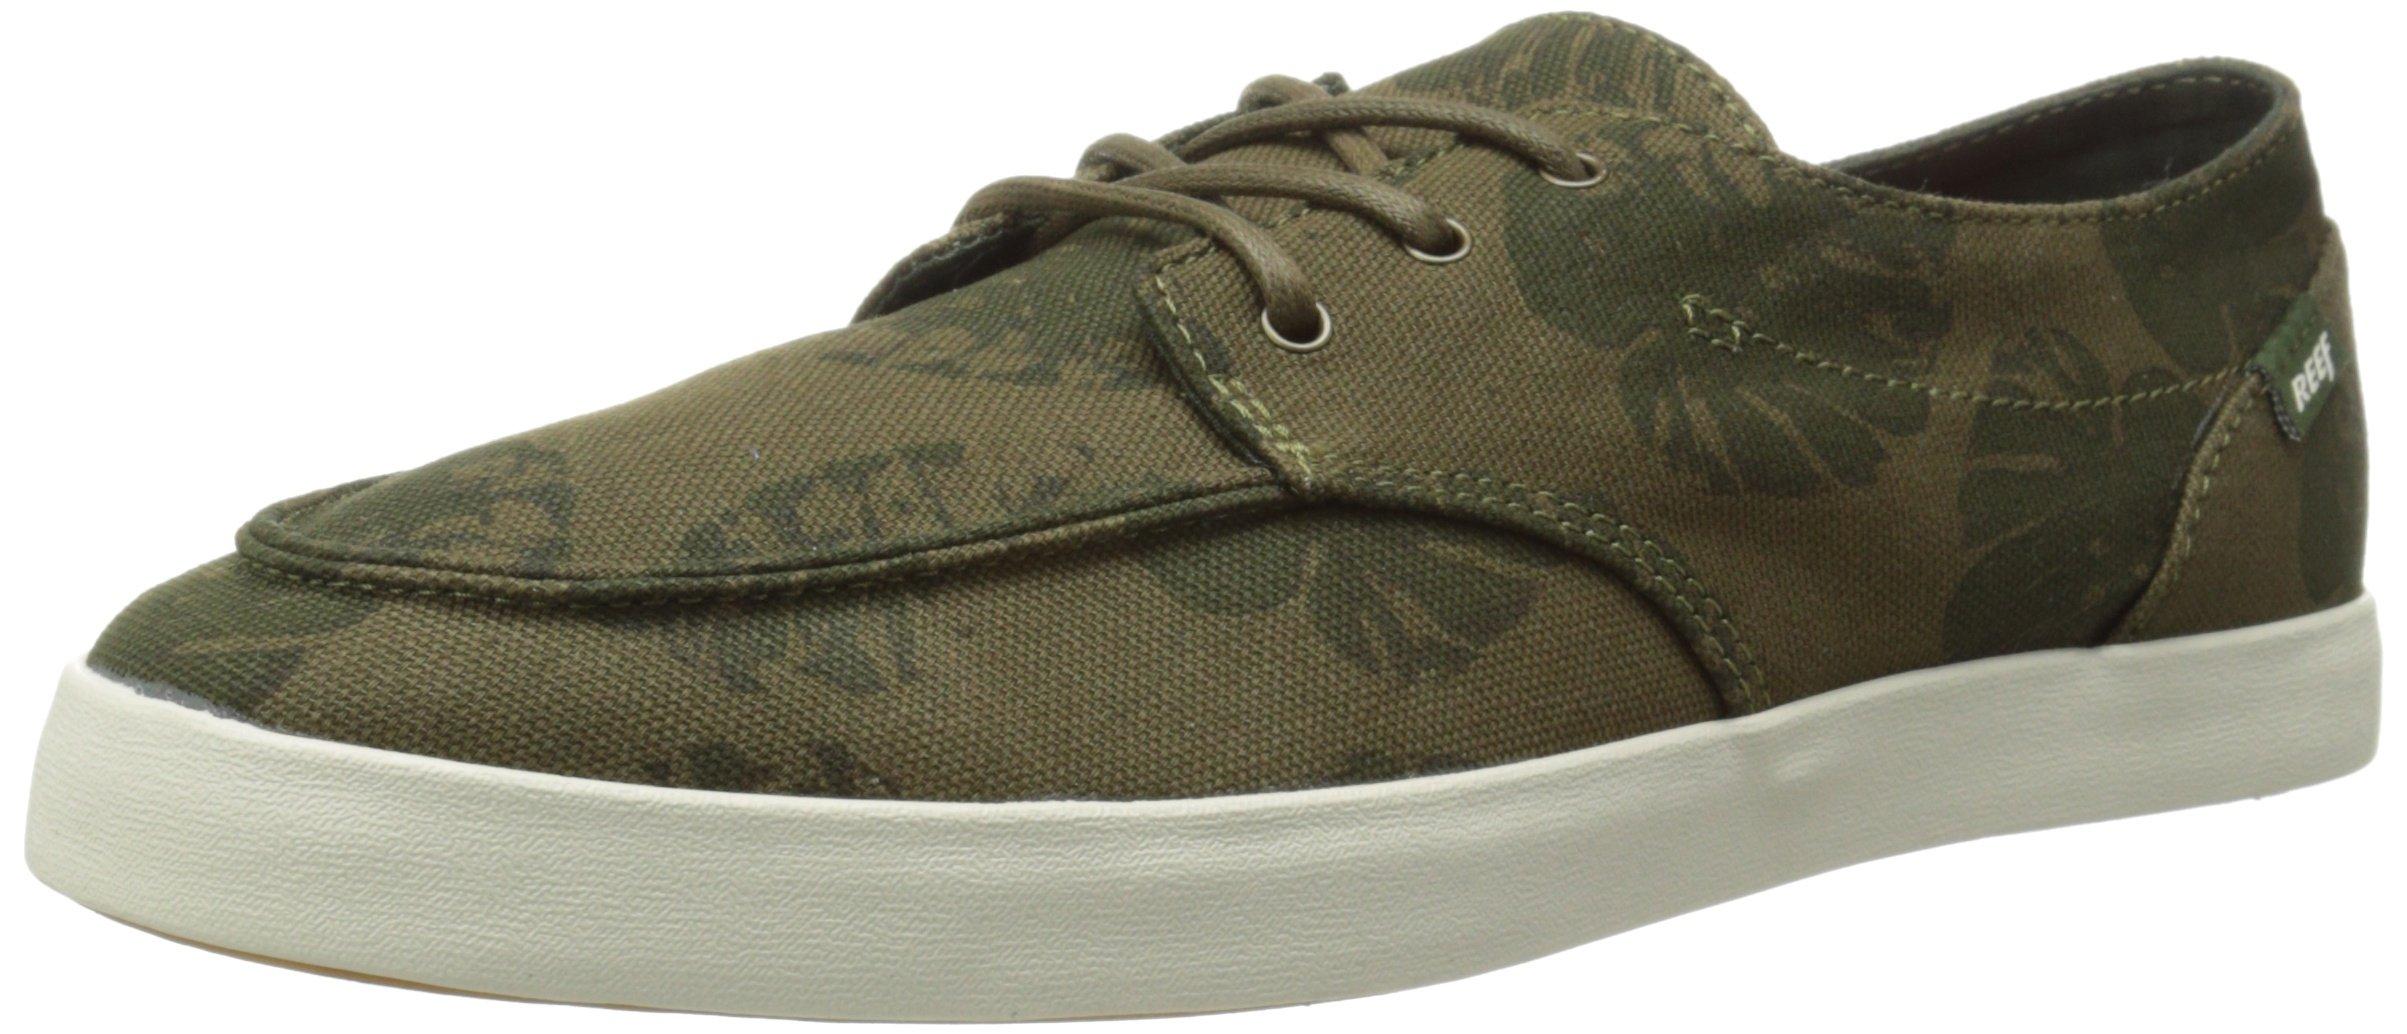 Reef Men's Deckhand 2 Prints Fashion Sneaker, Olive Palm, 11 M US